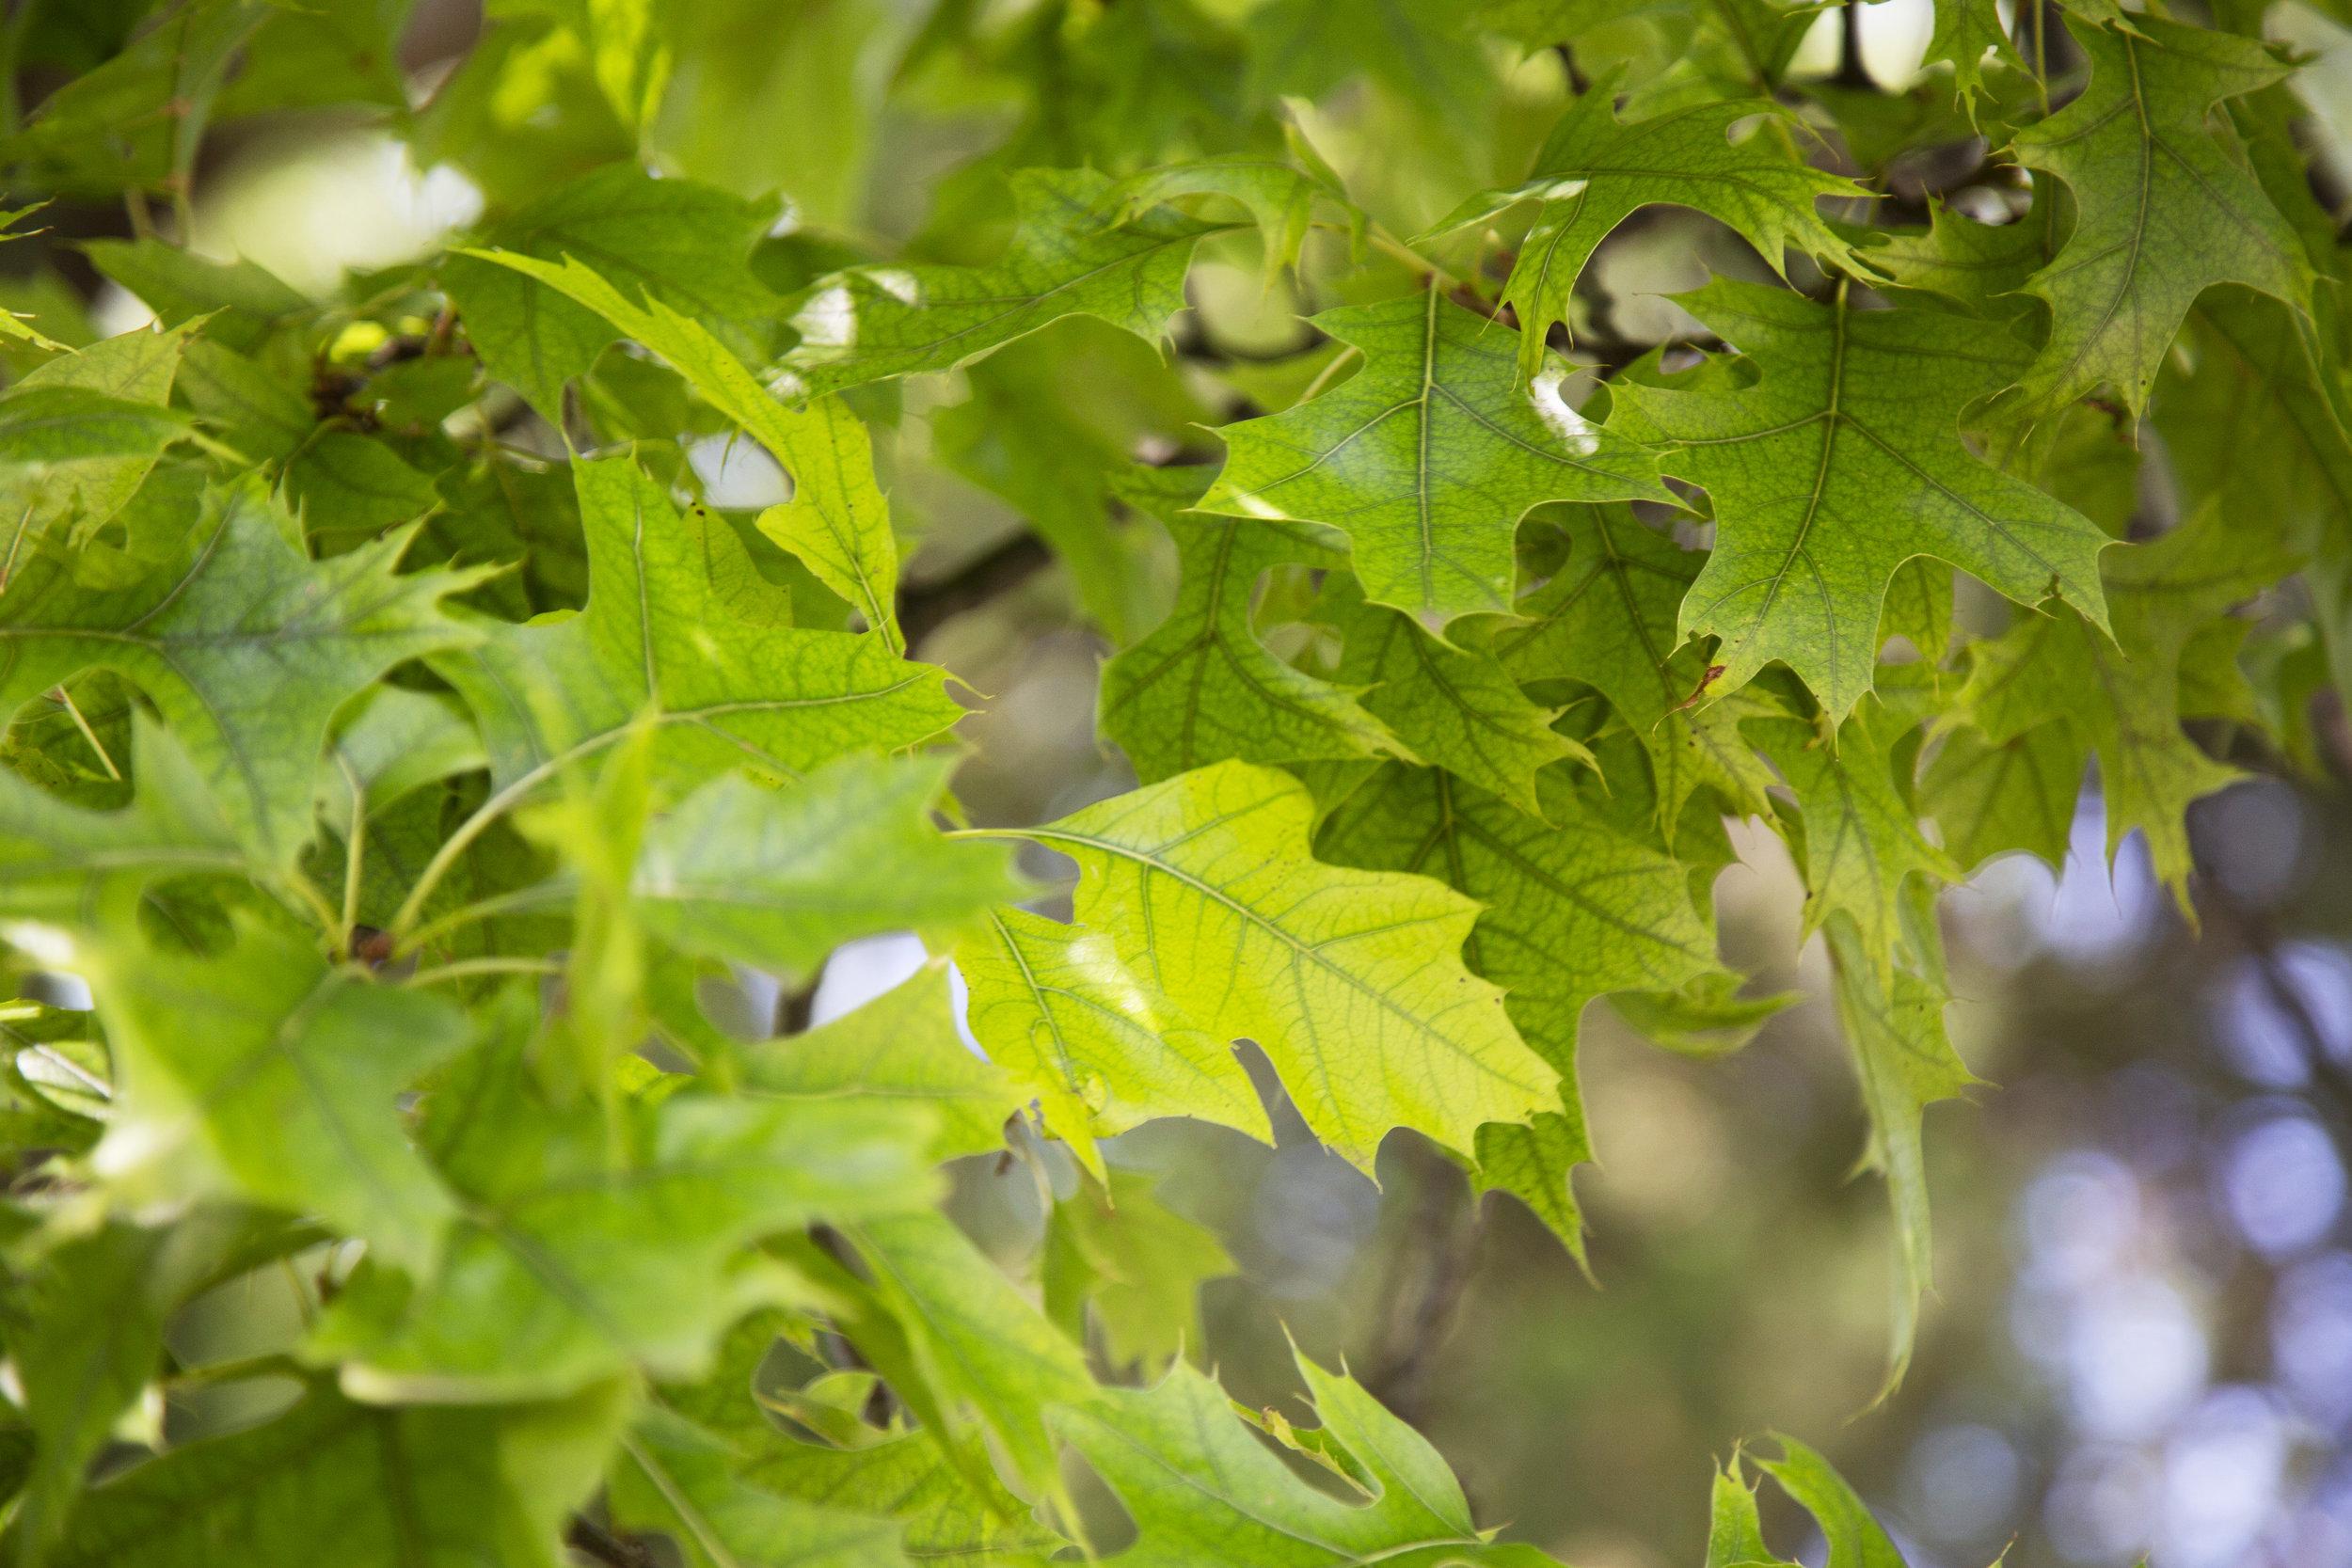 Chlorosis in a Pin Oak